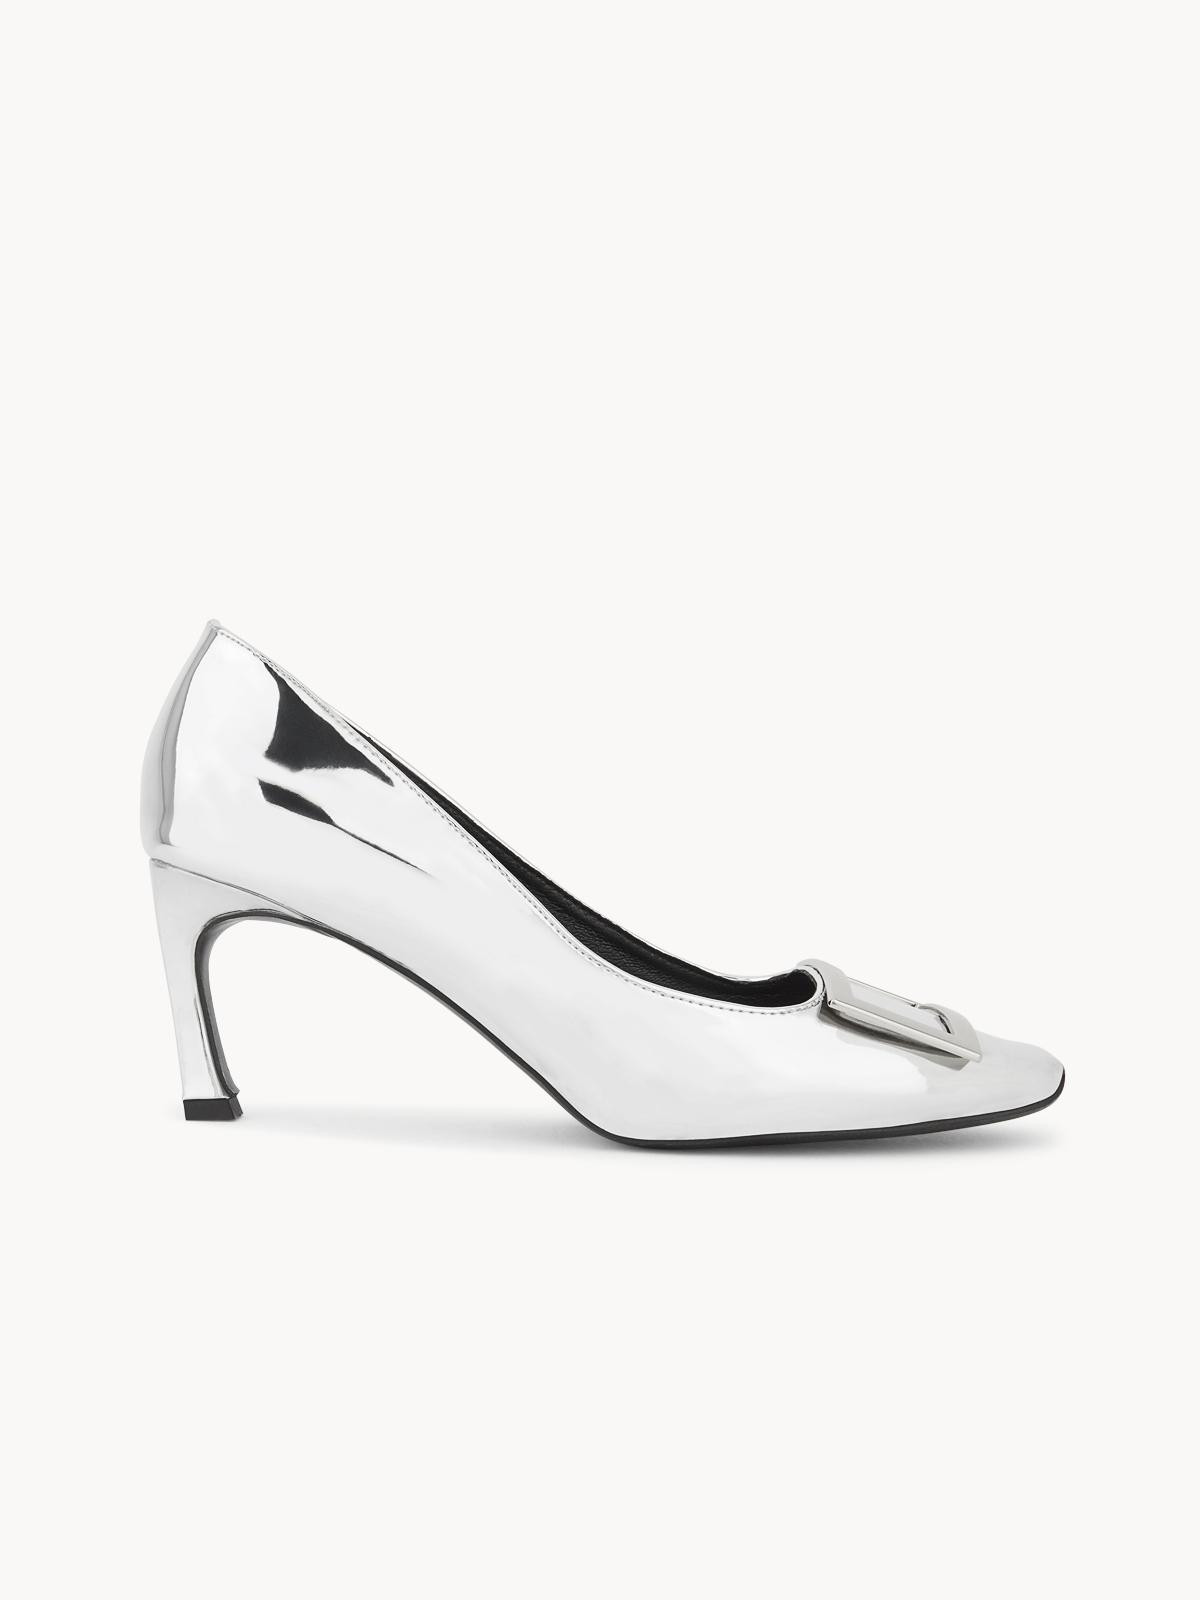 LookAtWe Stella Square Toe Heels Silver